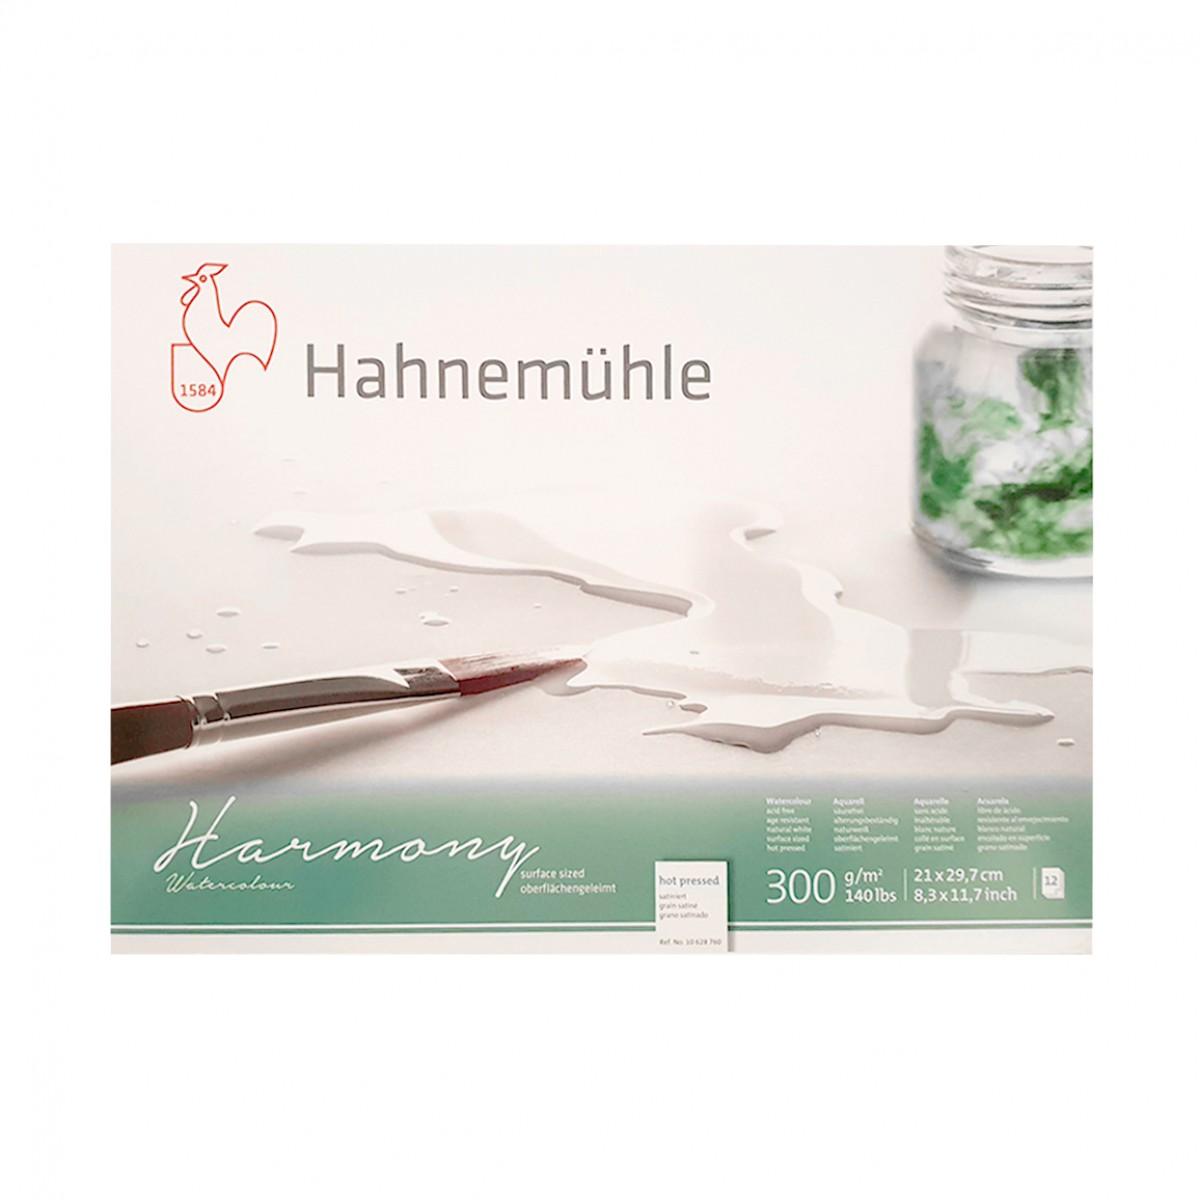 Hahnemühle Harmony Akvarel blok, Hot pressed, A4, 300gr.